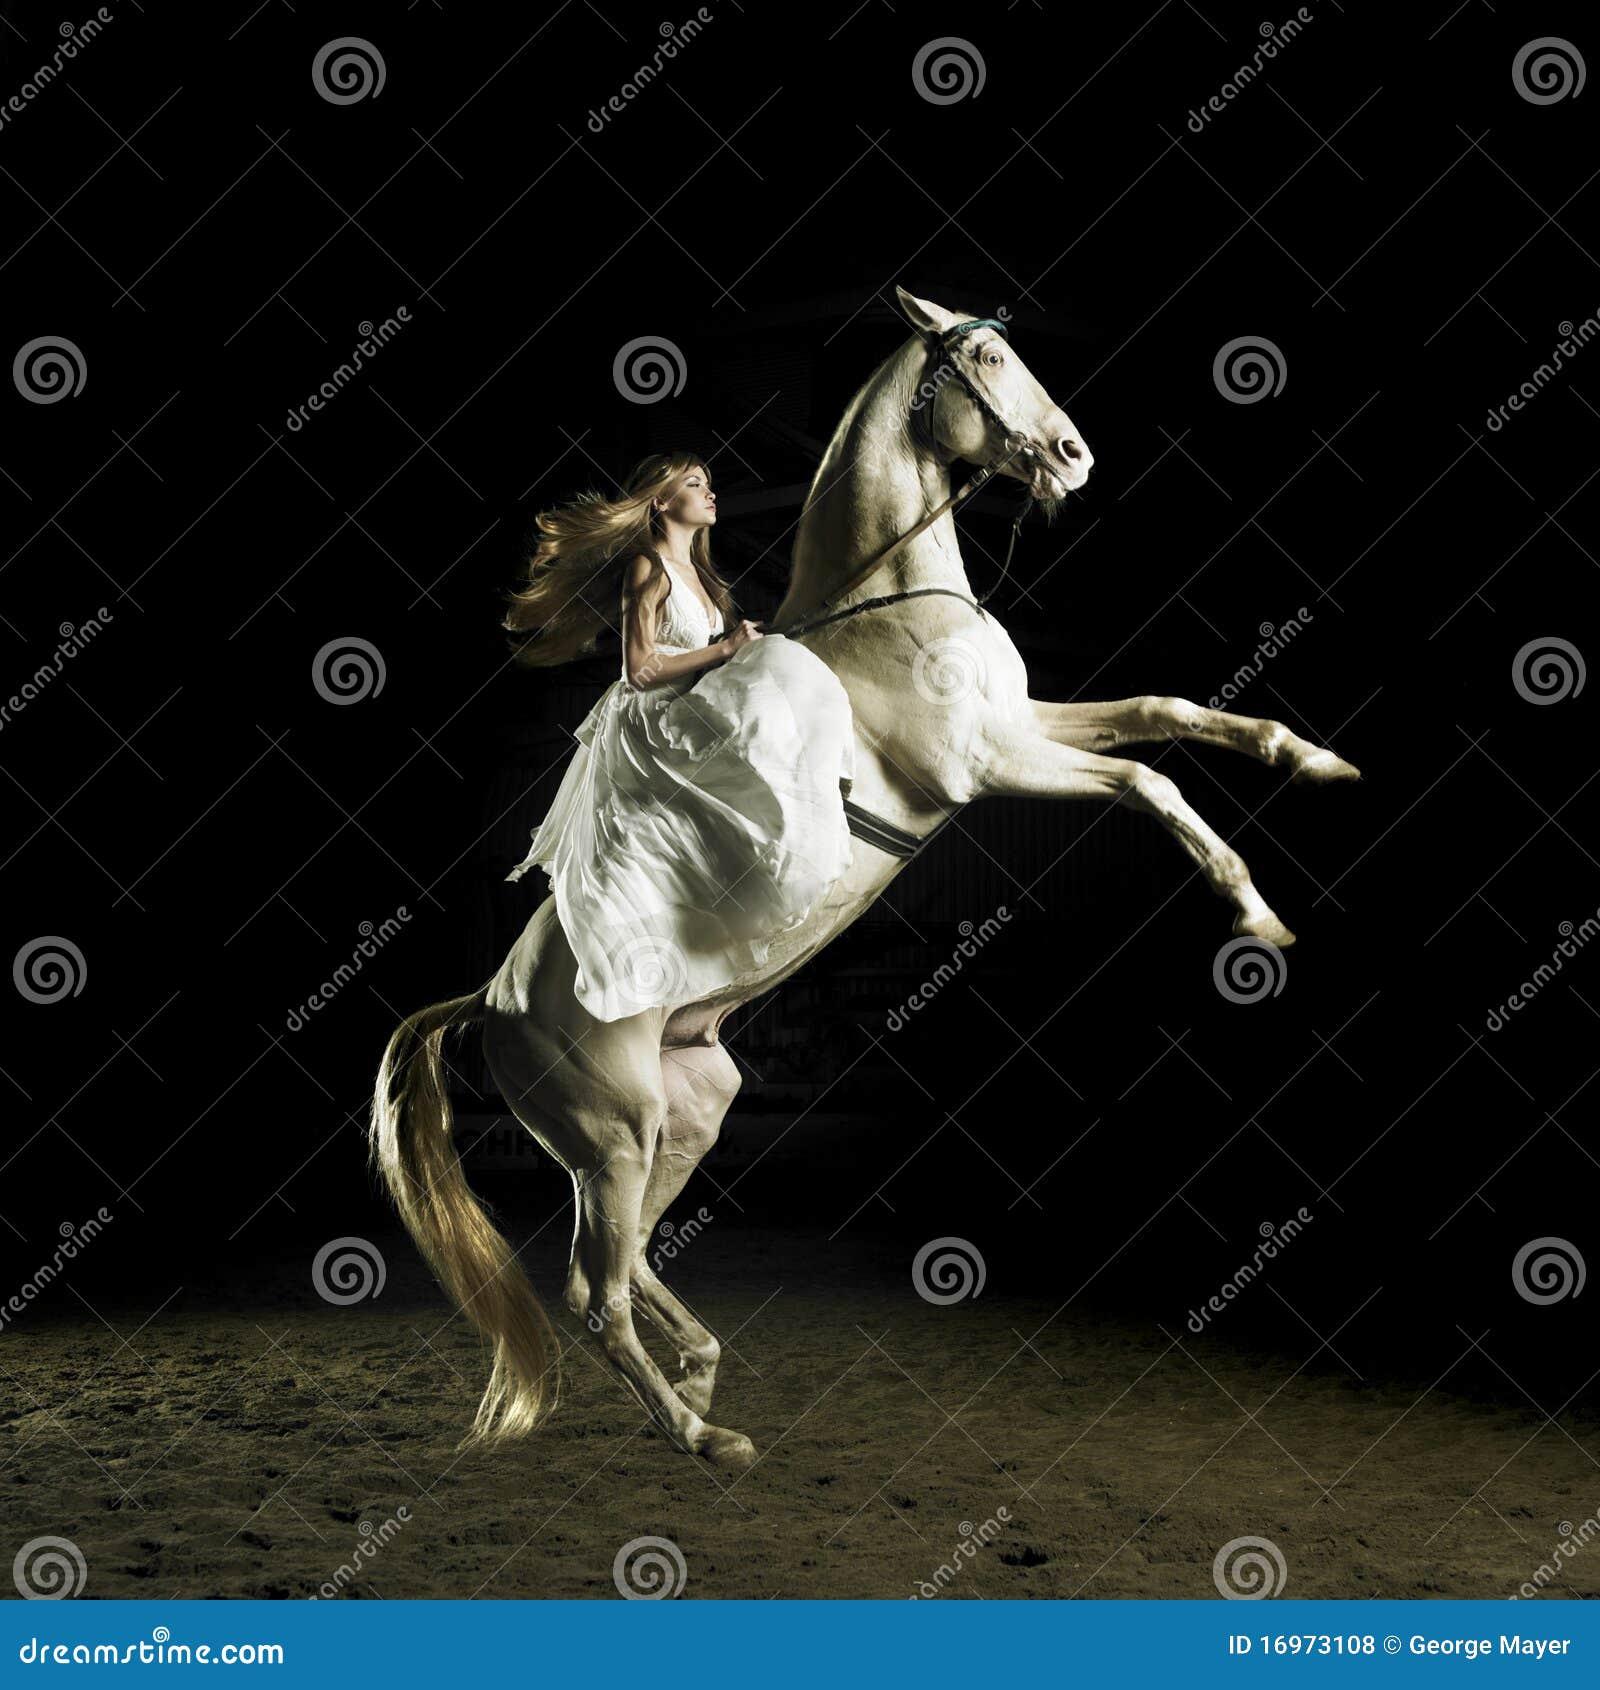 cheval wallpaper hd 1 - photo #31